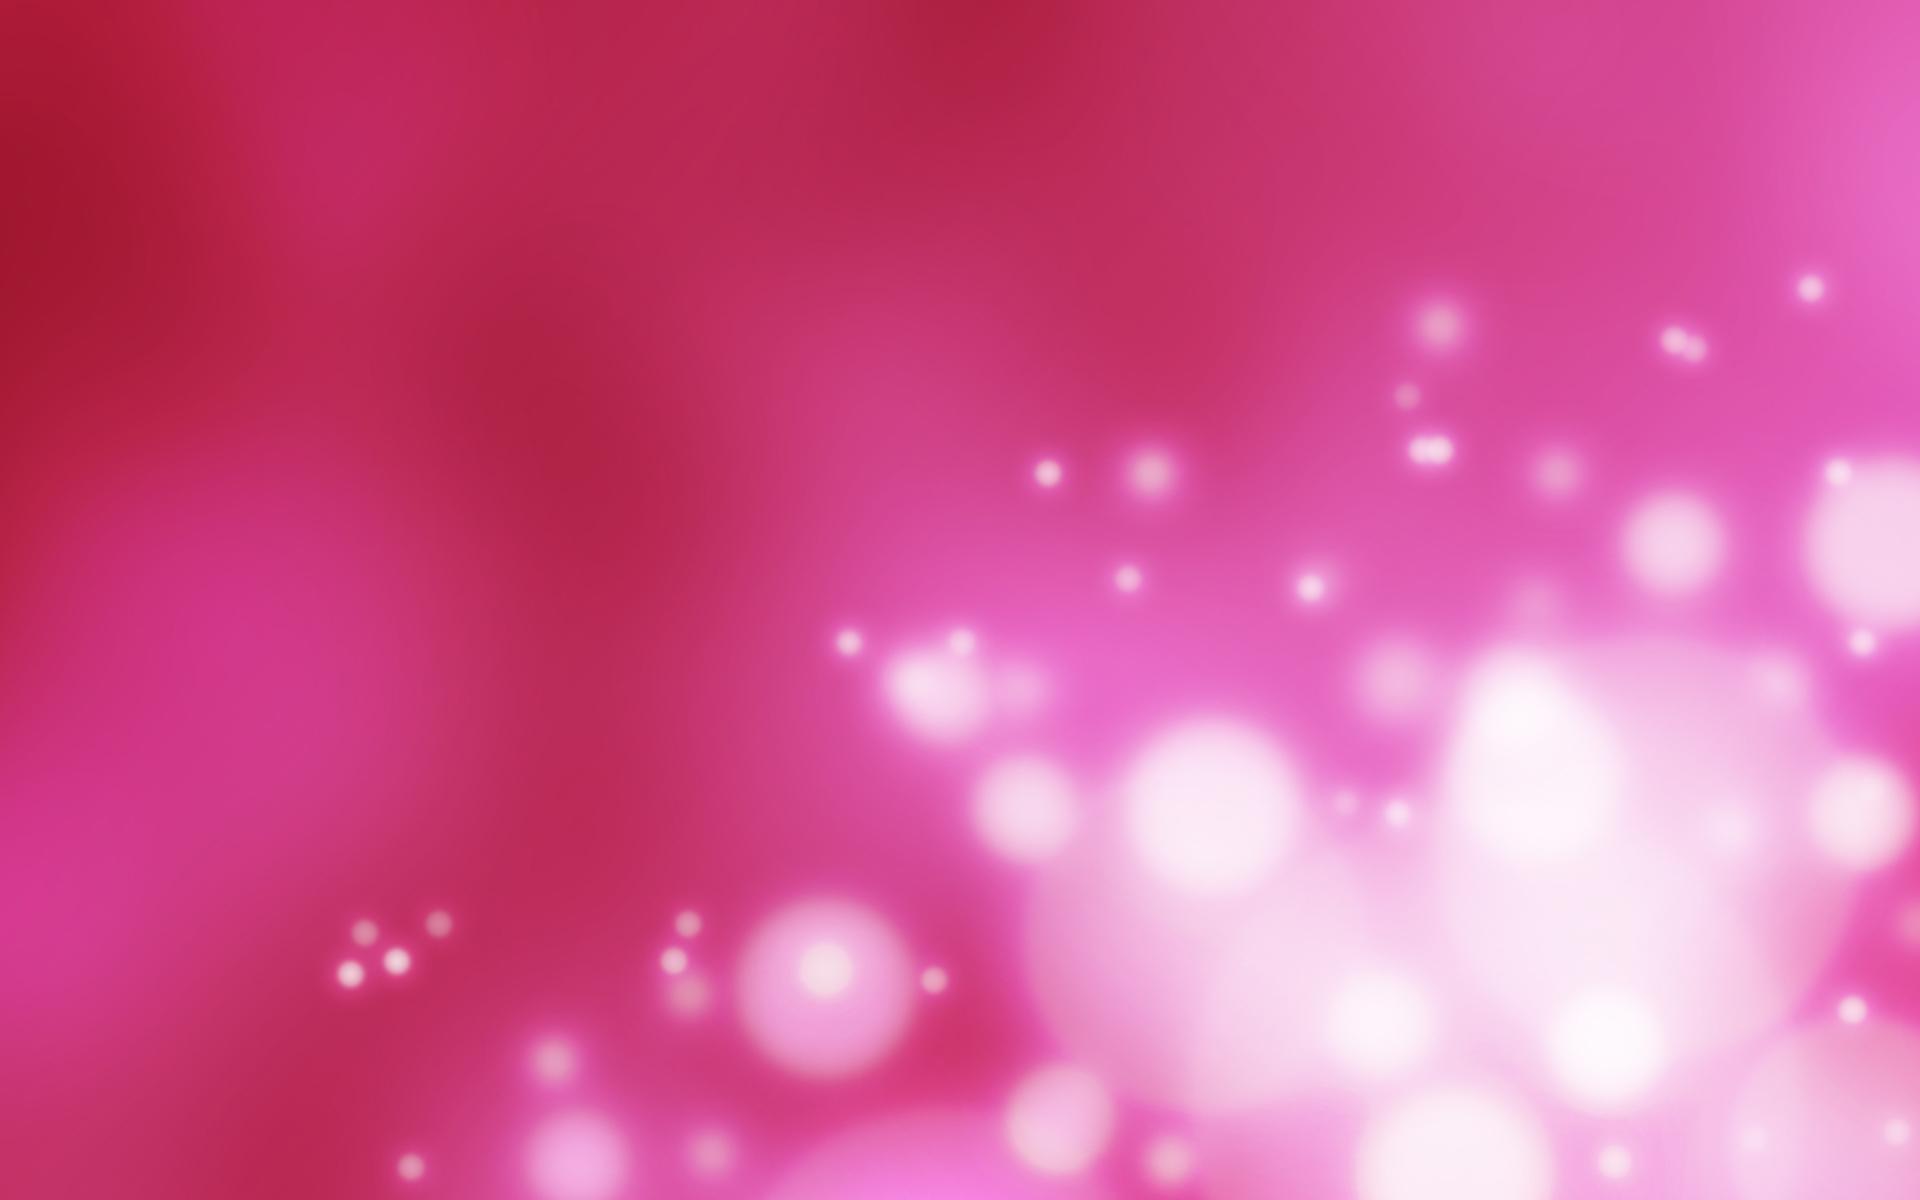 Cool Pink Iphone HD Wallpaper.